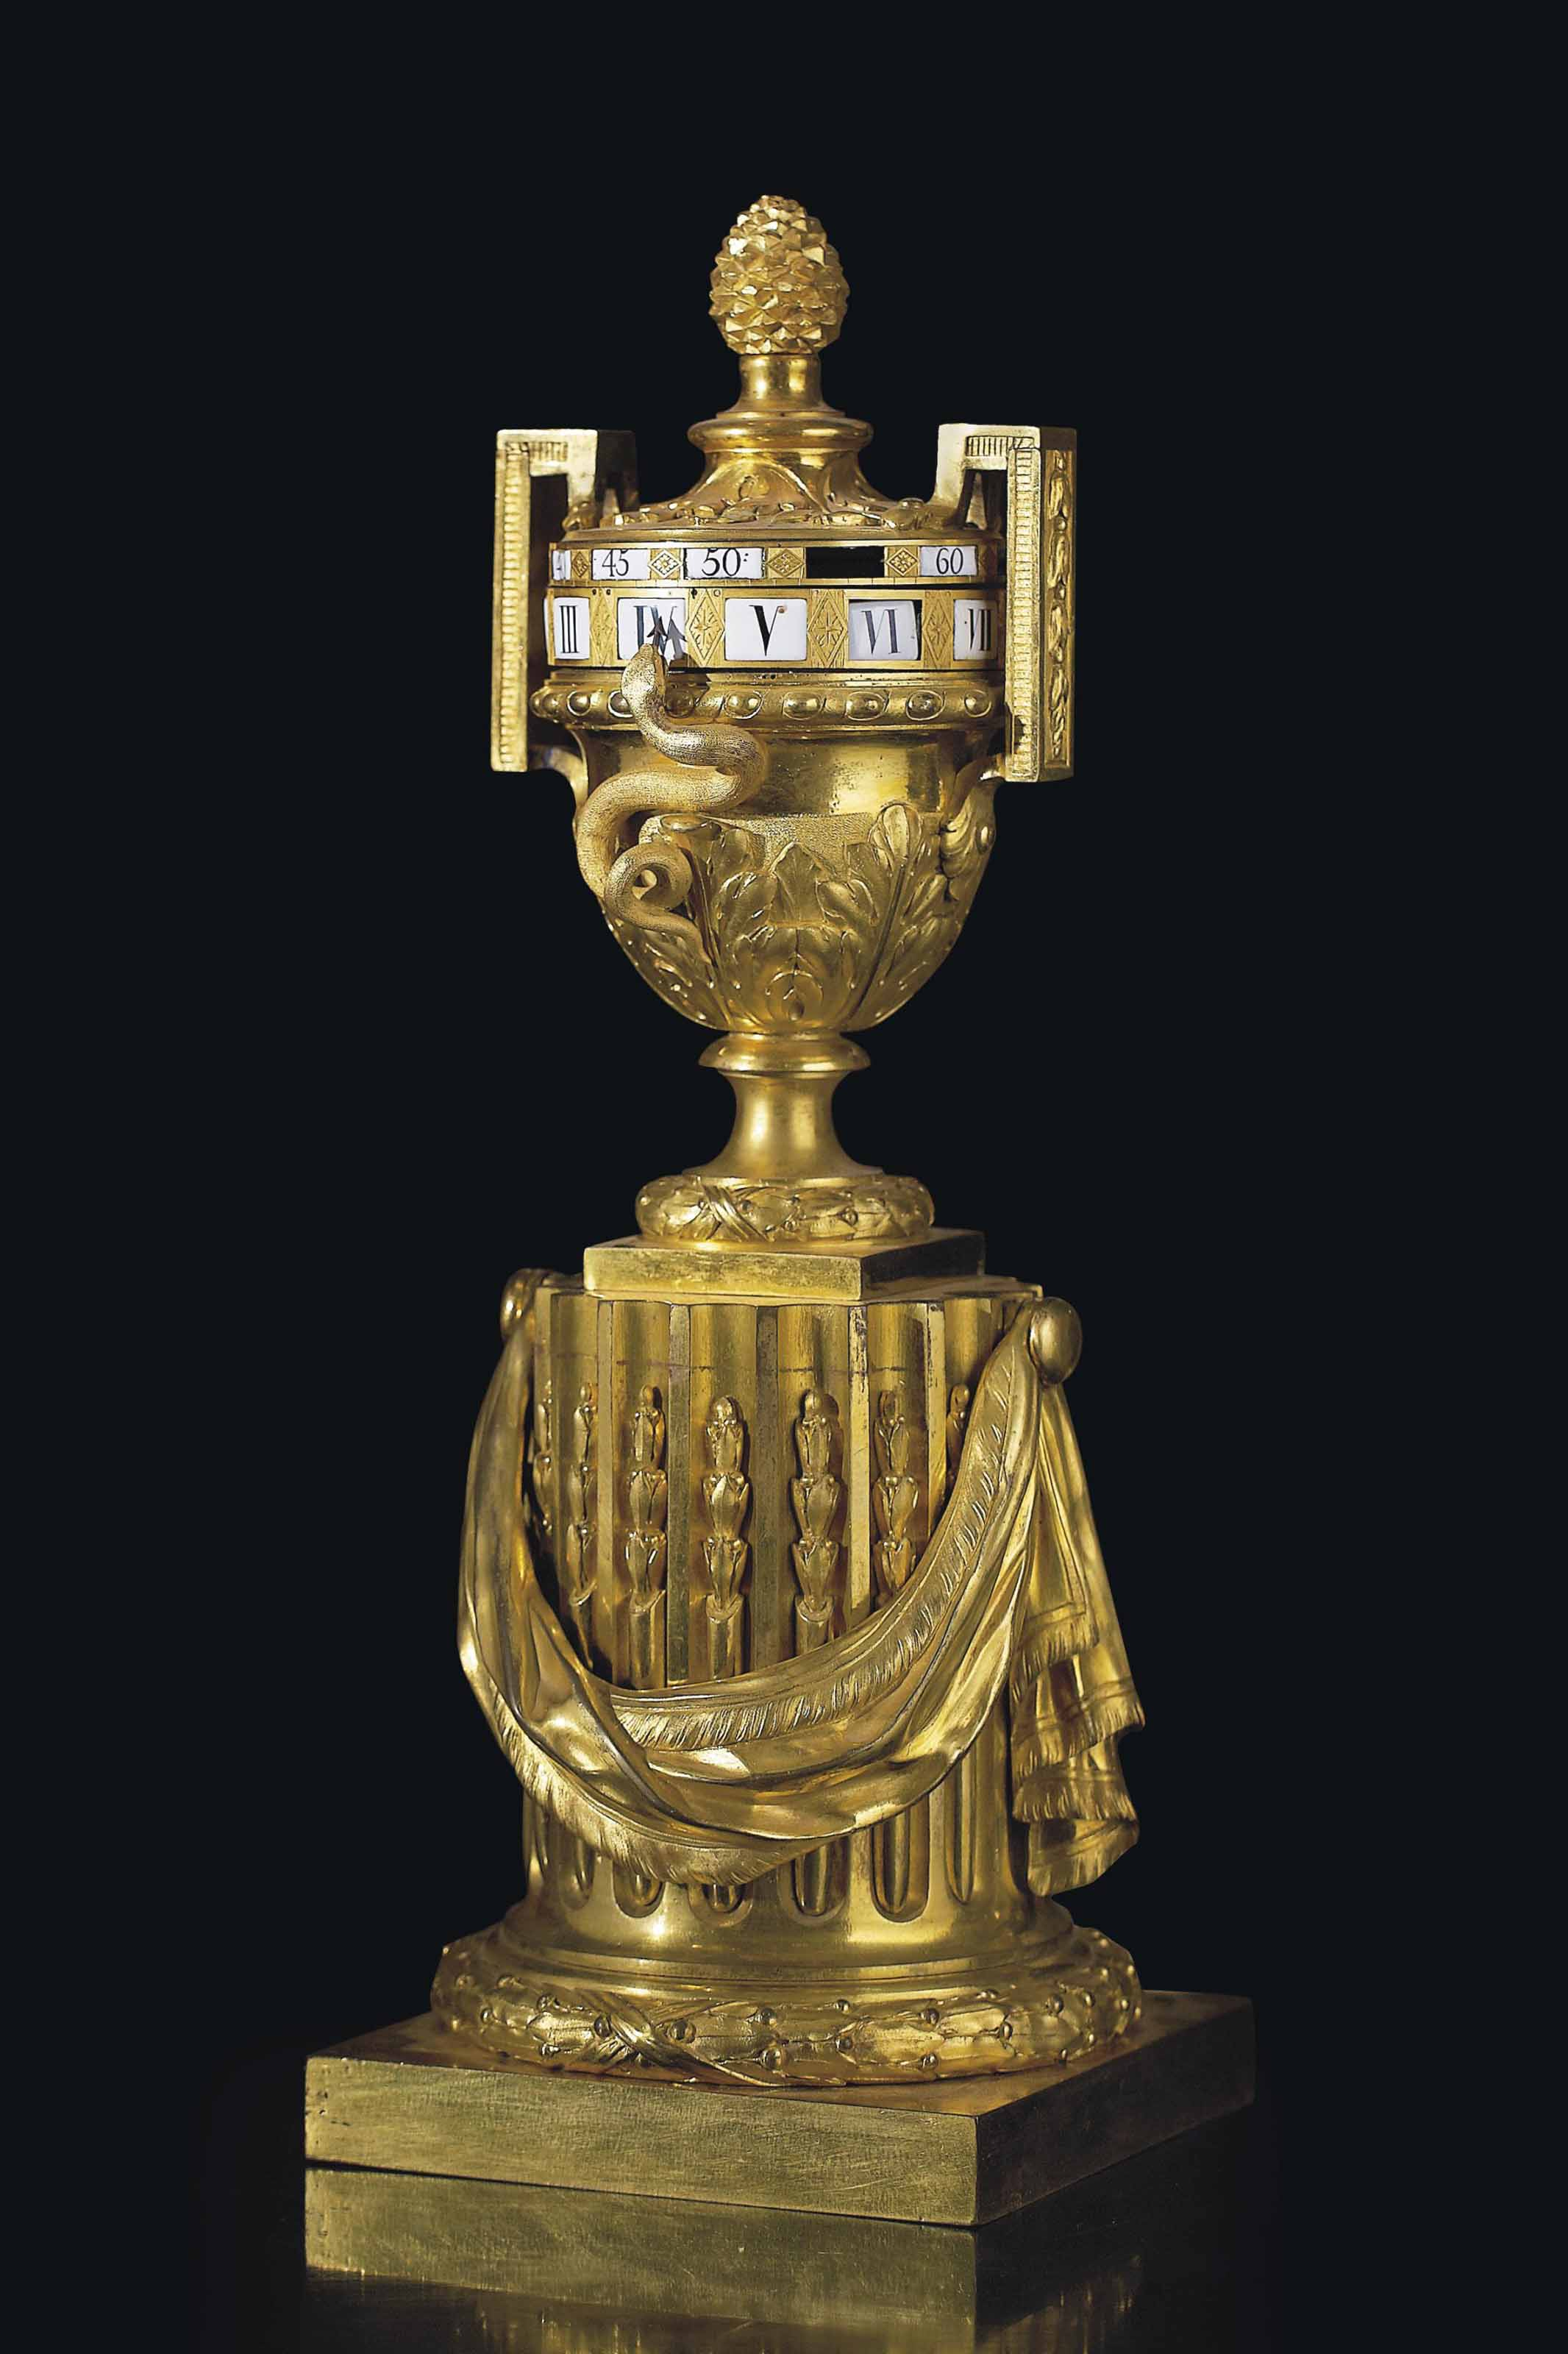 pendule en vase d 39 epoque louis xvi signature de robert osmond vers 1770 christie 39 s. Black Bedroom Furniture Sets. Home Design Ideas